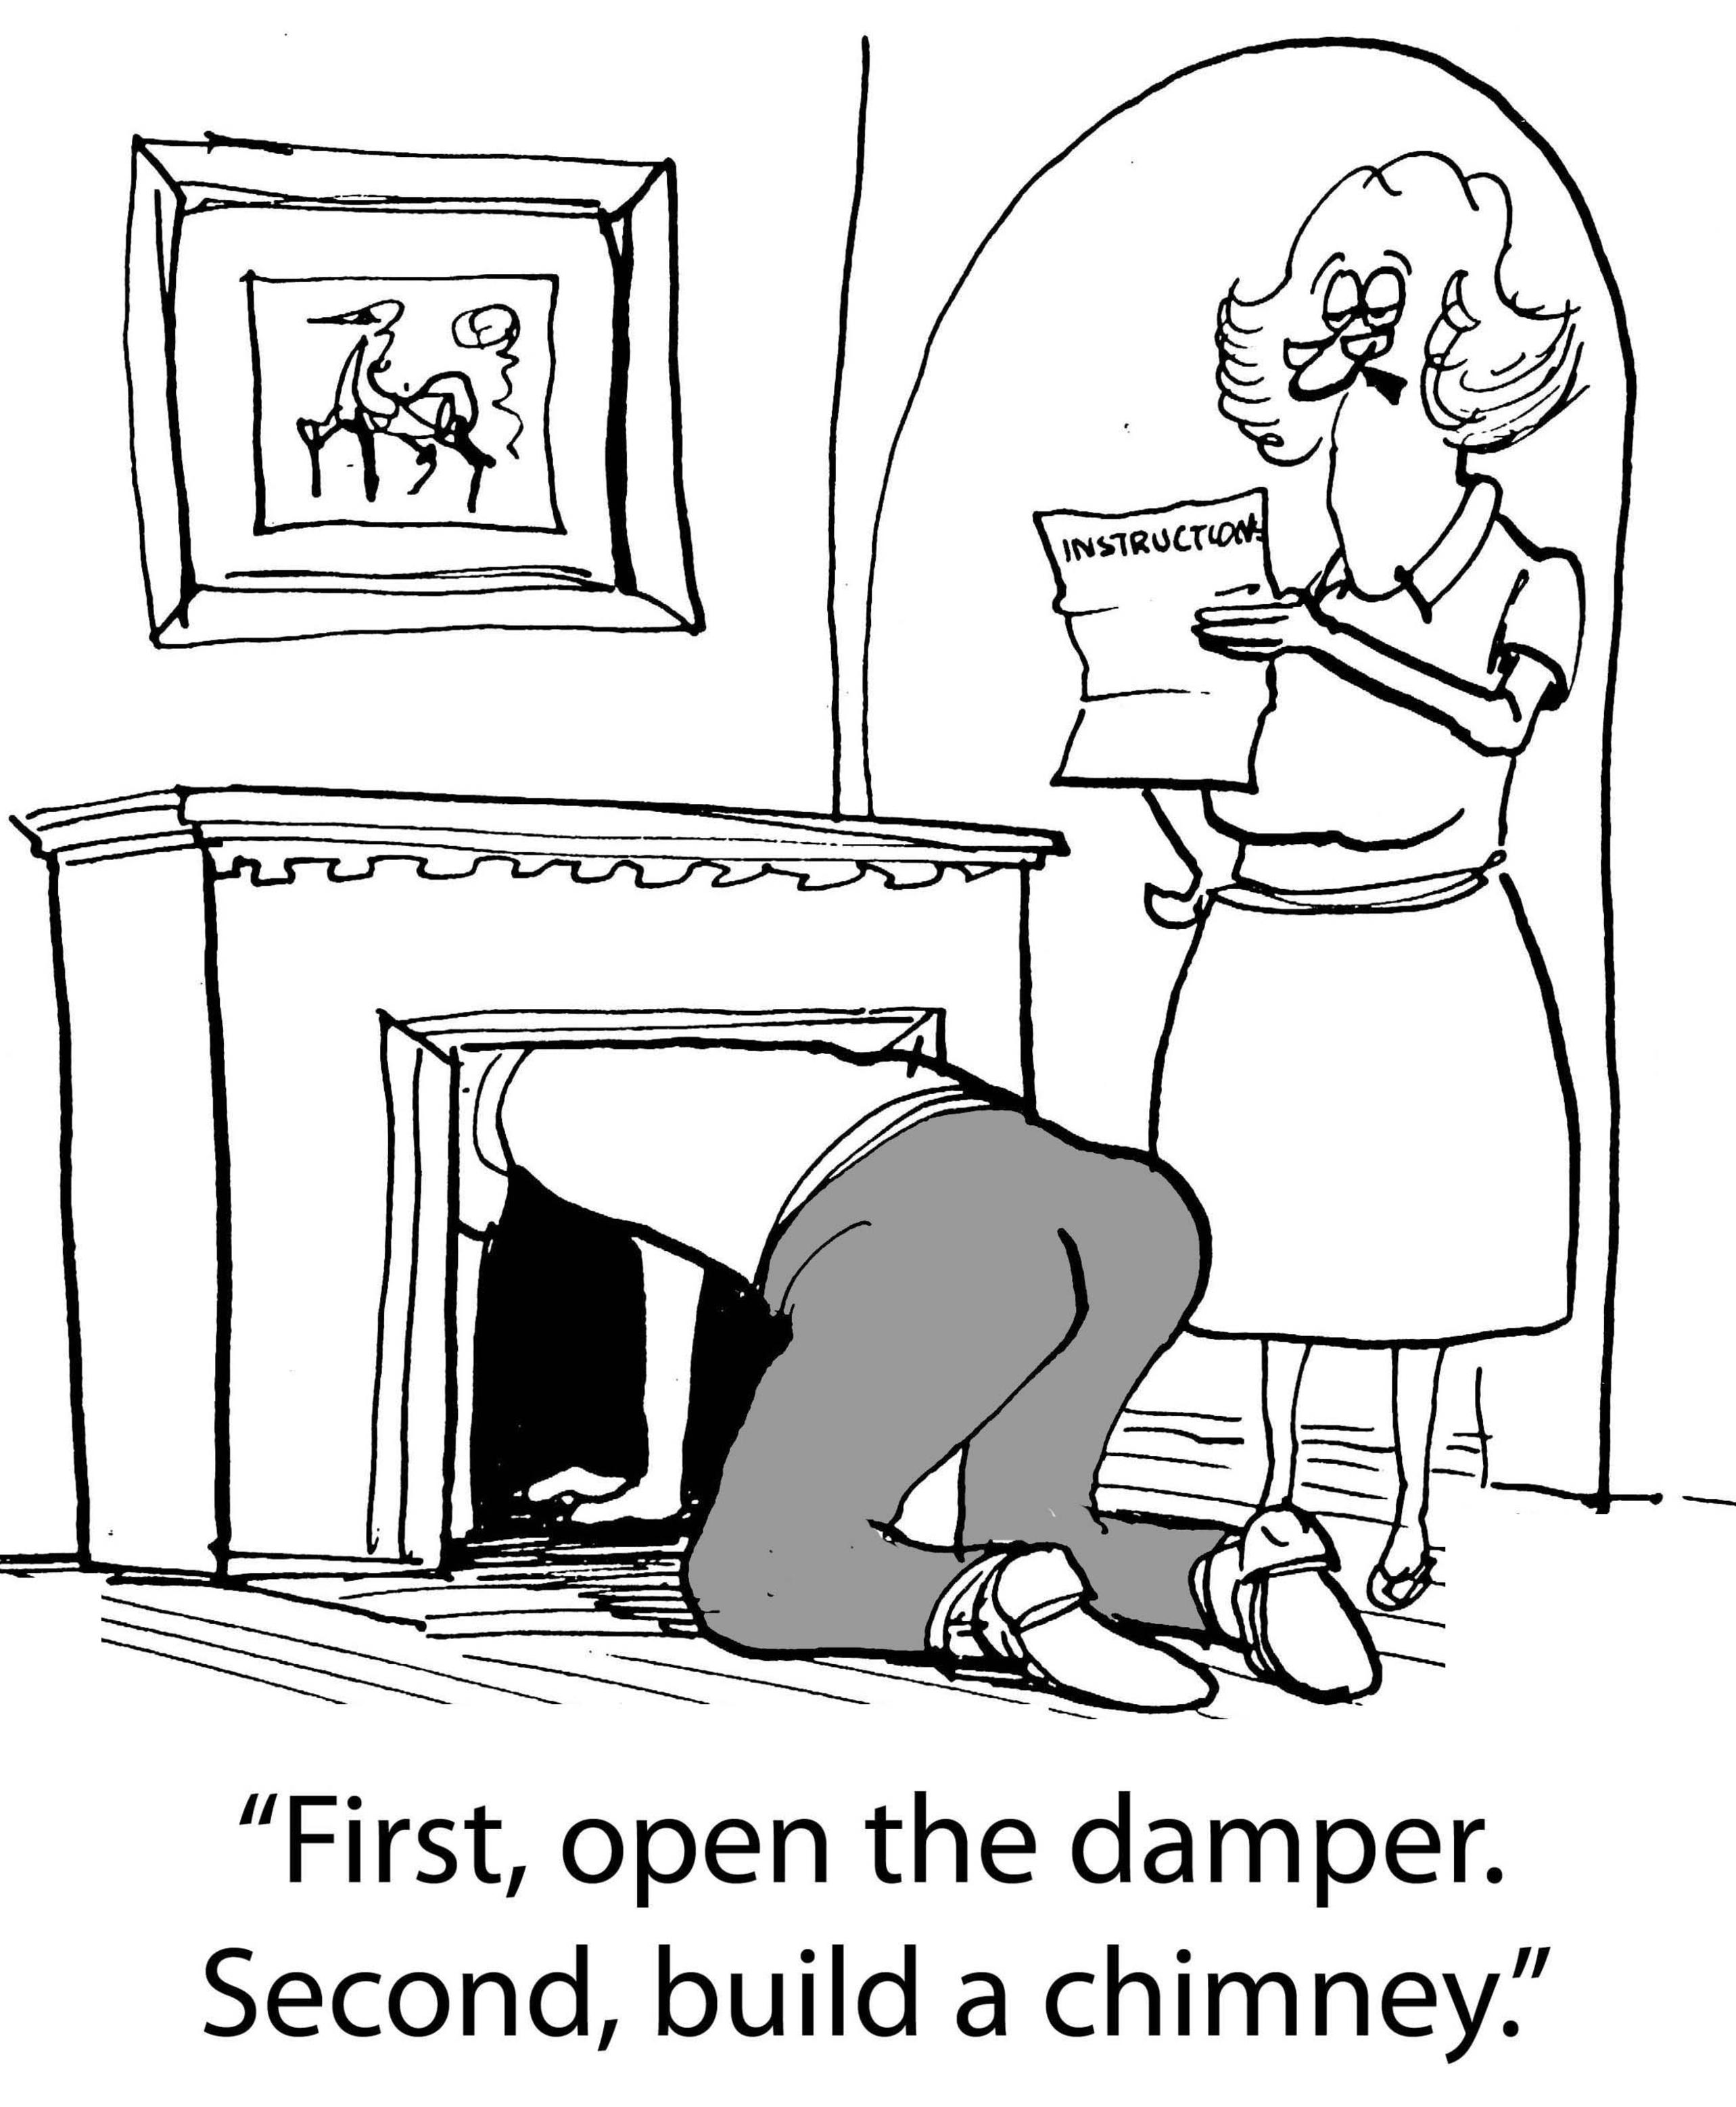 Chimney Damper And Types